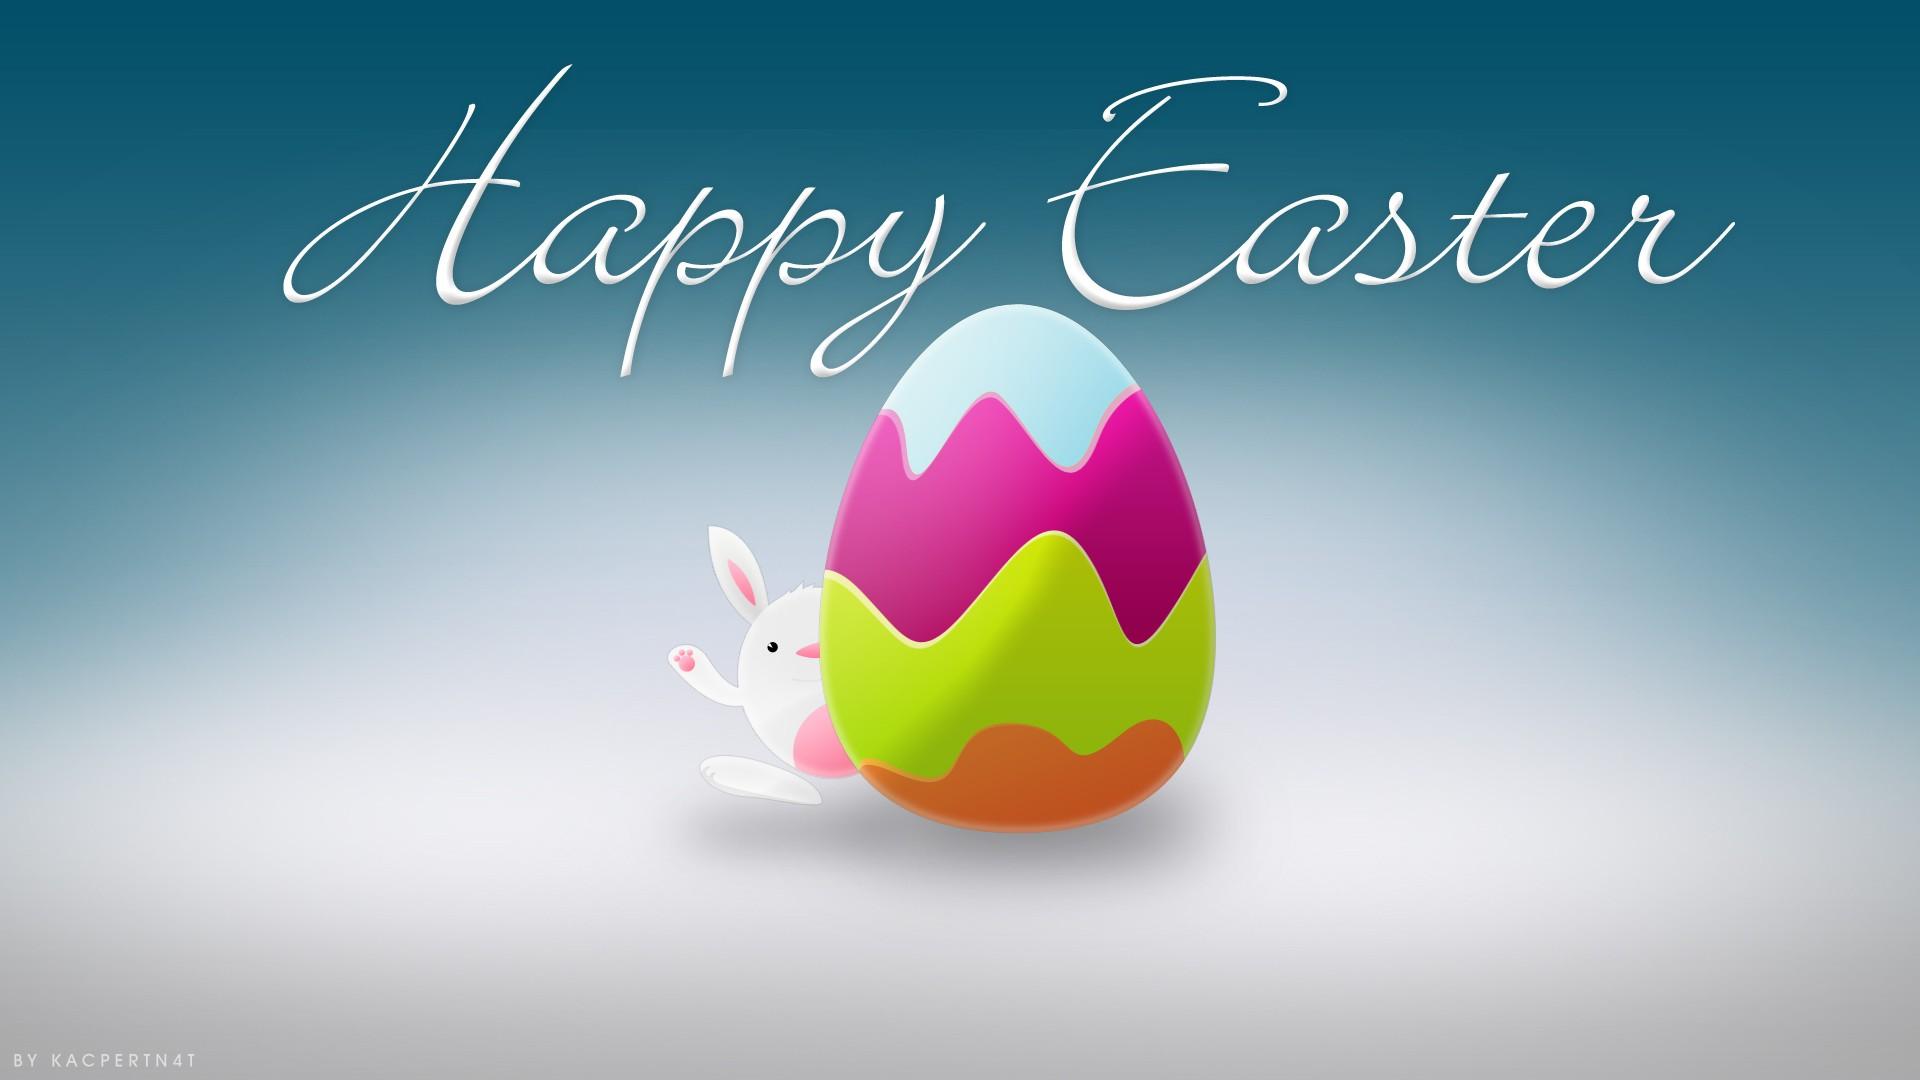 35 Happy Easter Desktop Wallpaper HD for 1920x1080